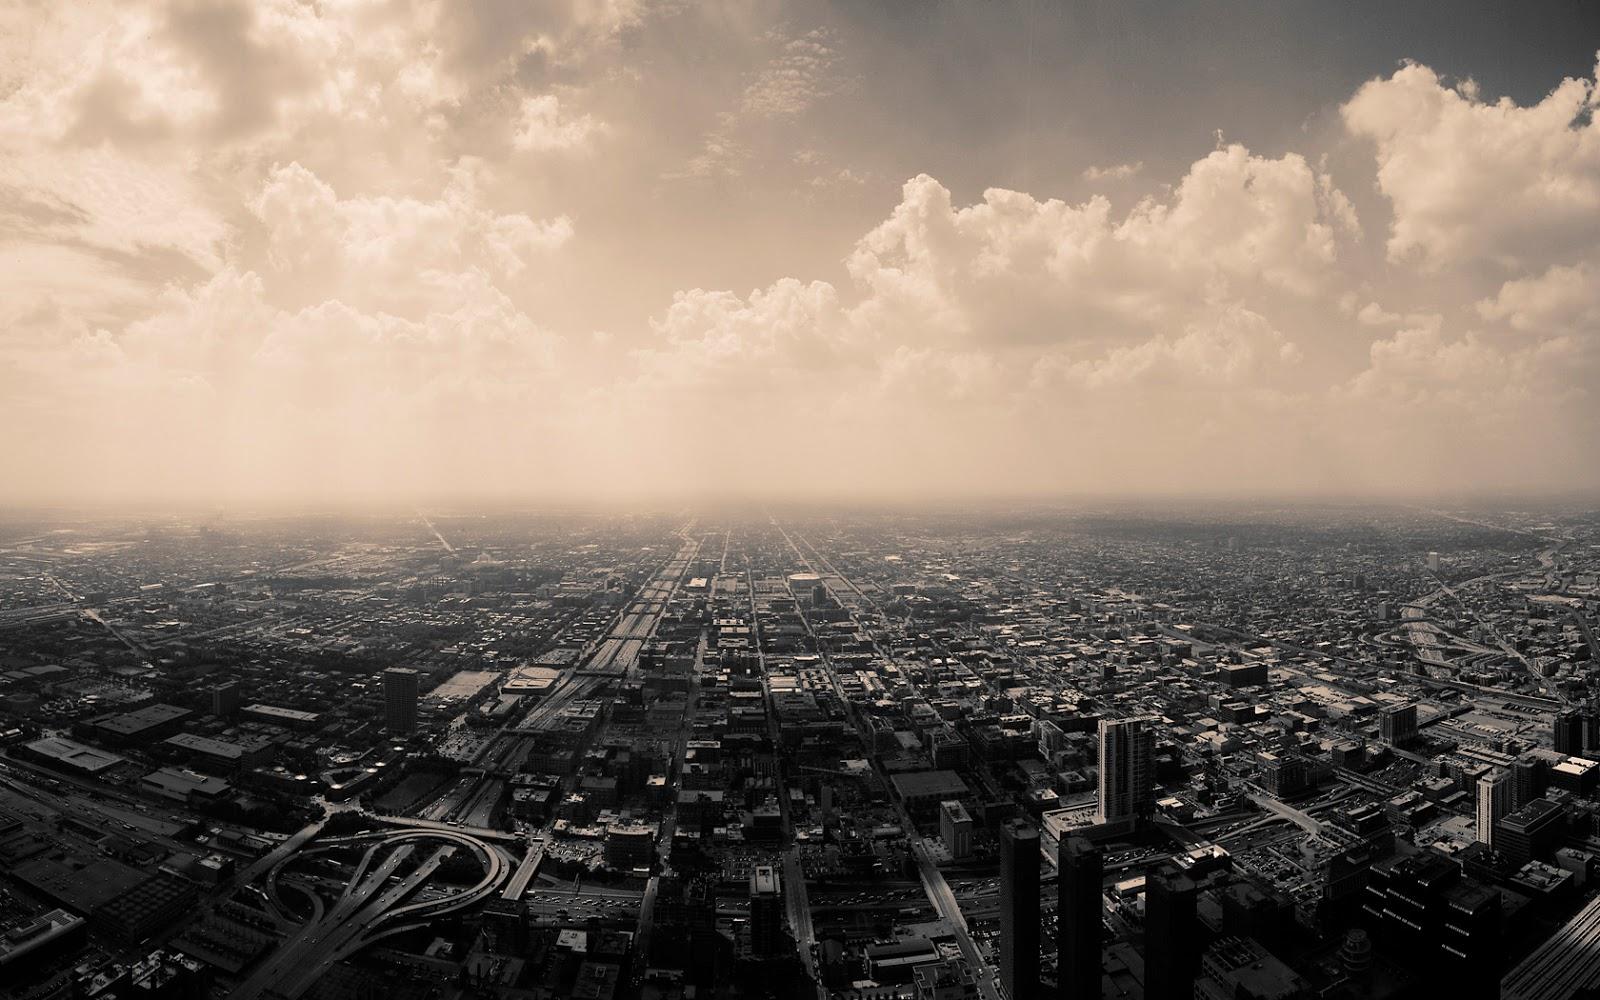 Fmx Wallpaper Hd Sad City Above Cityscape Hd Wallpaper The Wallpaper Database